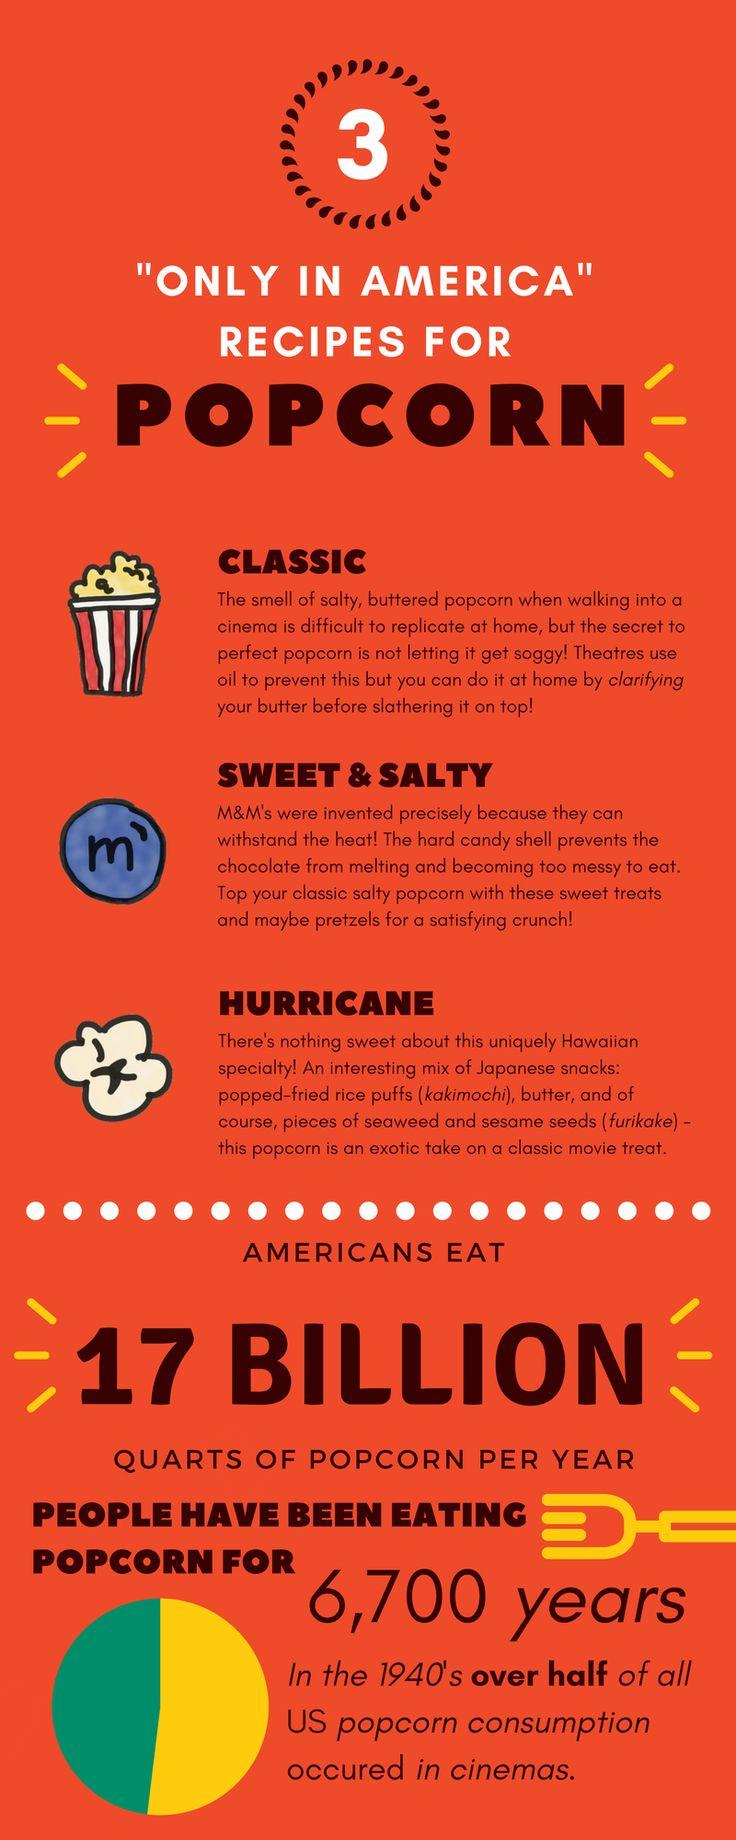 3 Easy American Popcorn Recipes    #Popcorn #Infographic #America #Recipes #Theatres